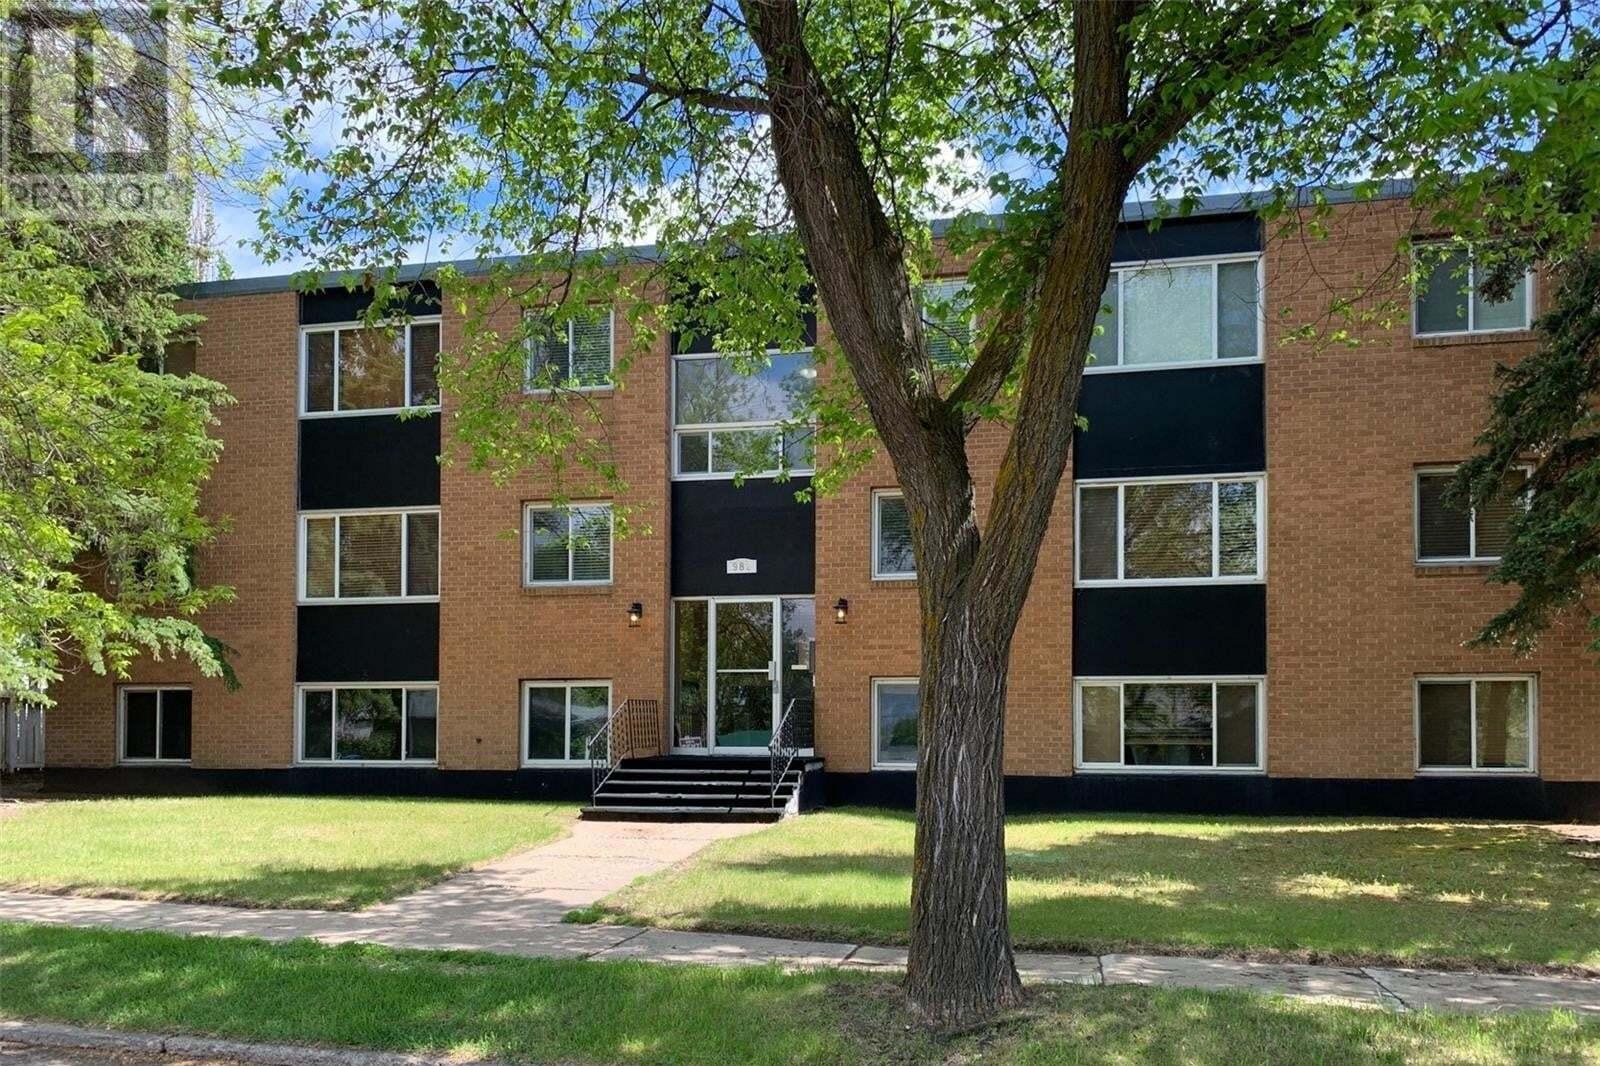 Townhouse for sale at 982 105th St North Battleford Saskatchewan - MLS: SK826161